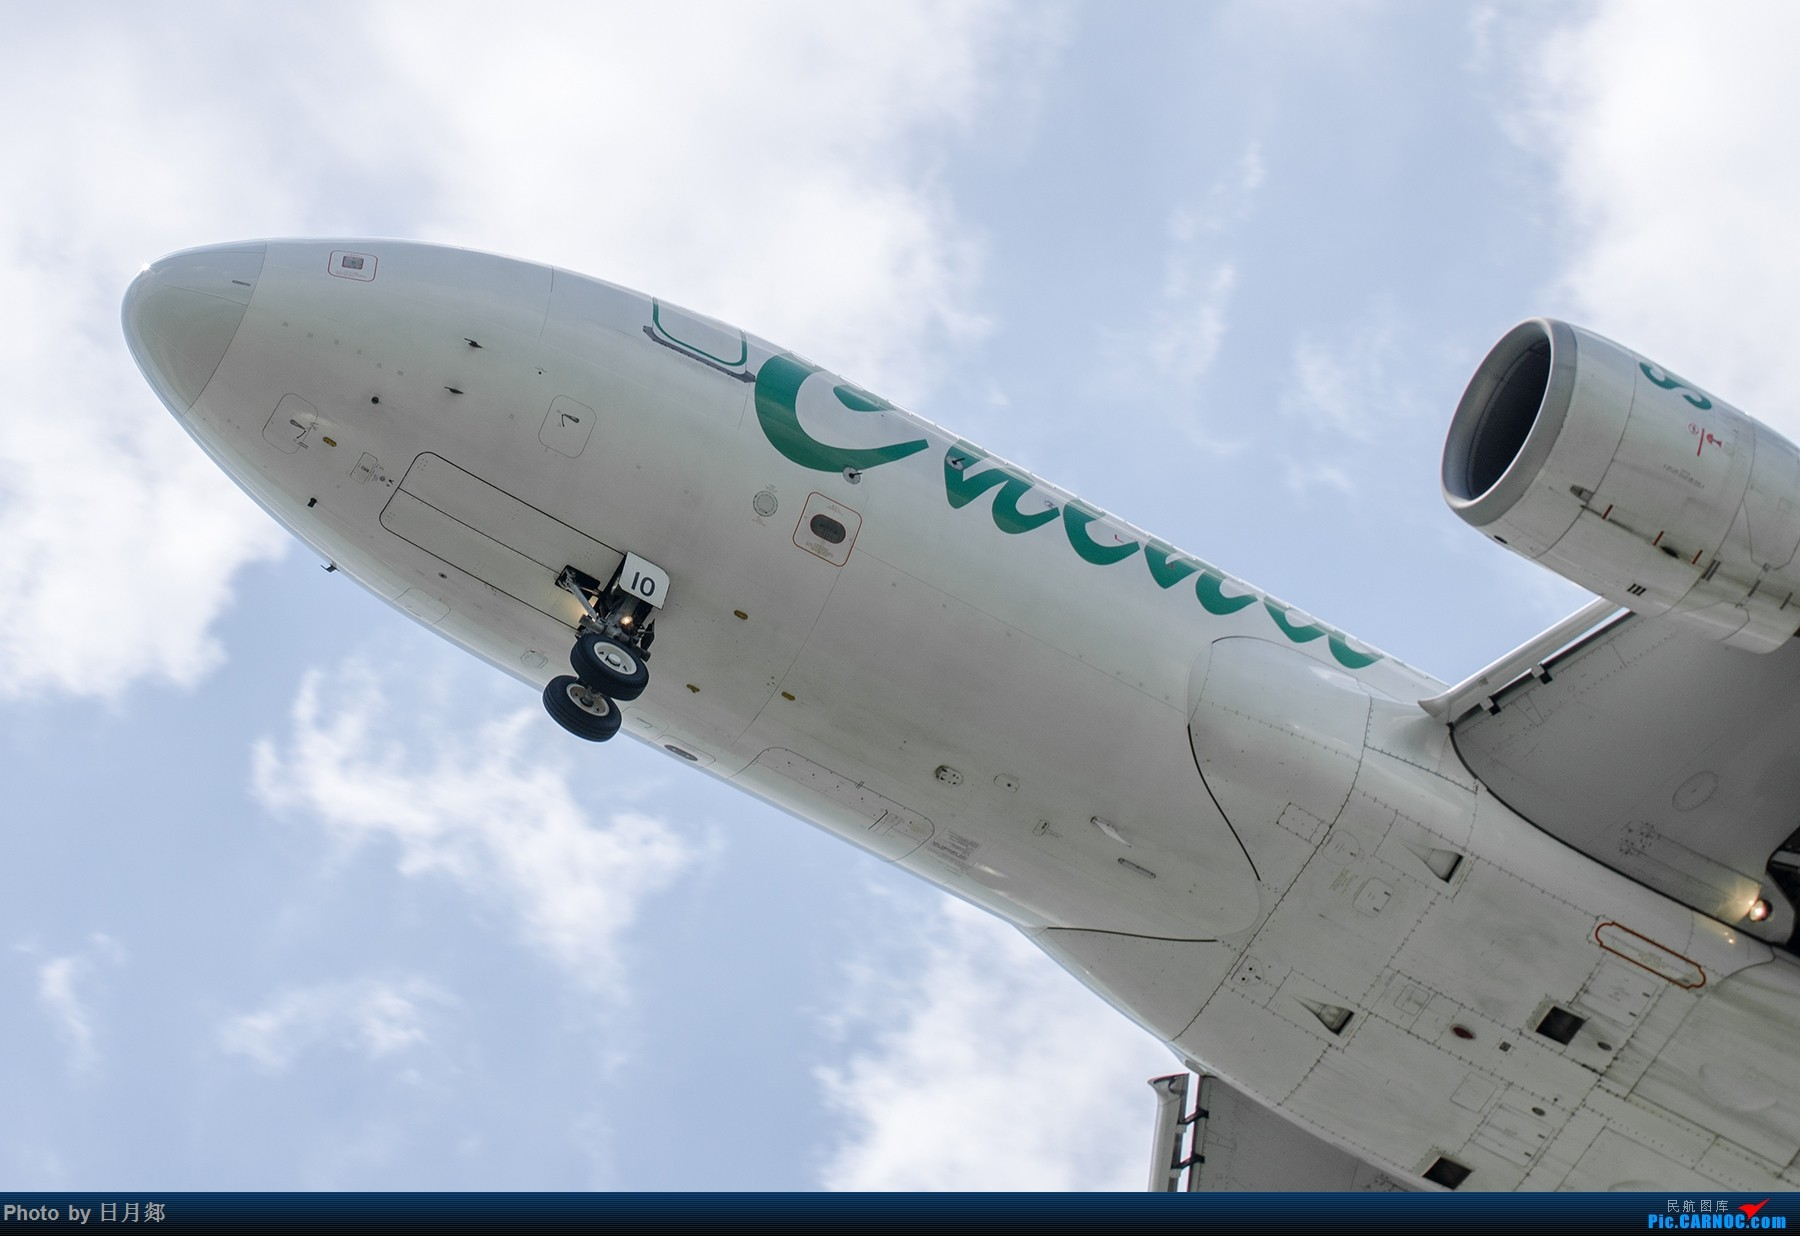 Re:[原创]【SHA拍机*1800大图】图要抓紧发,不然就要炒冷饭,大头镇贴 AIRBUS A320-200 B-6310 中国上海虹桥国际机场